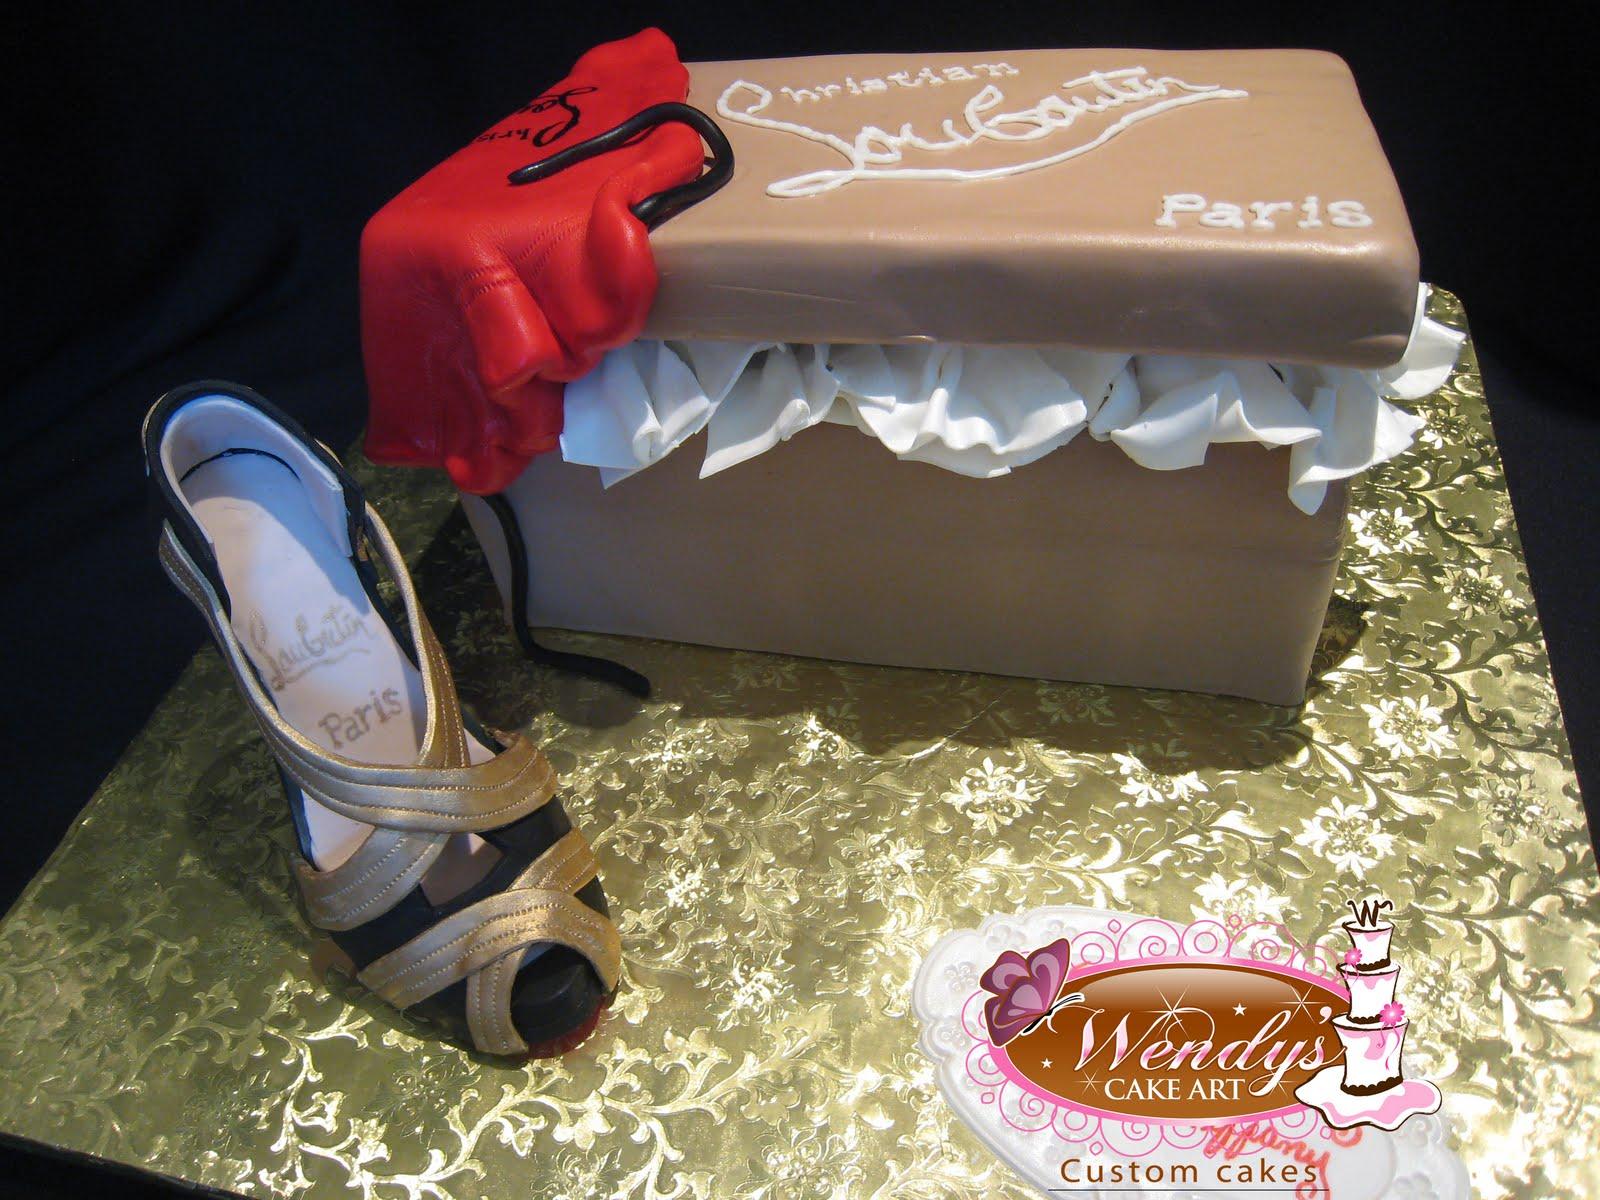 wendys-cake-art-loubie-shoe-box